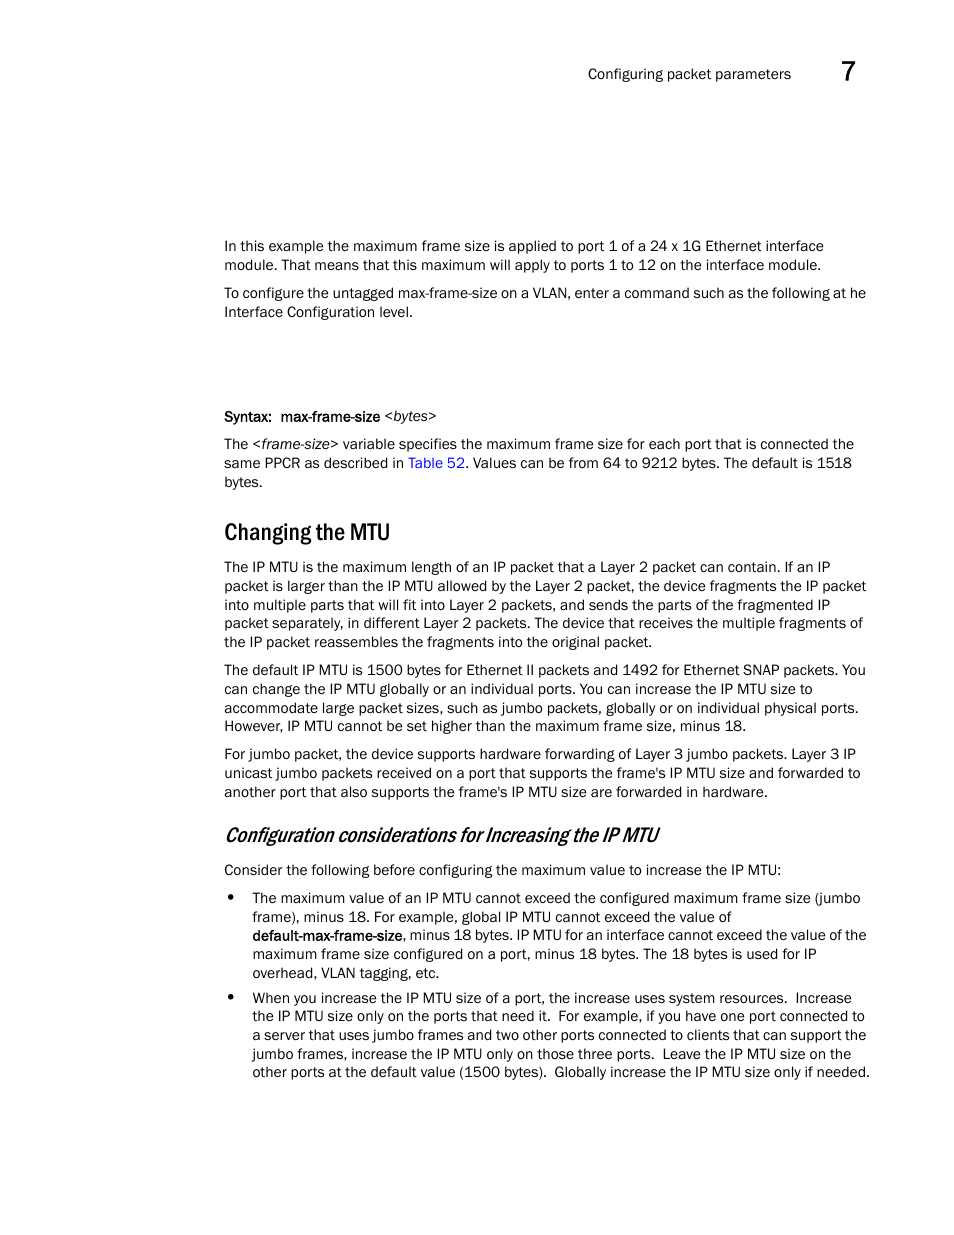 Changing the mtu, Changing the | Brocade BigIron RX Series ...